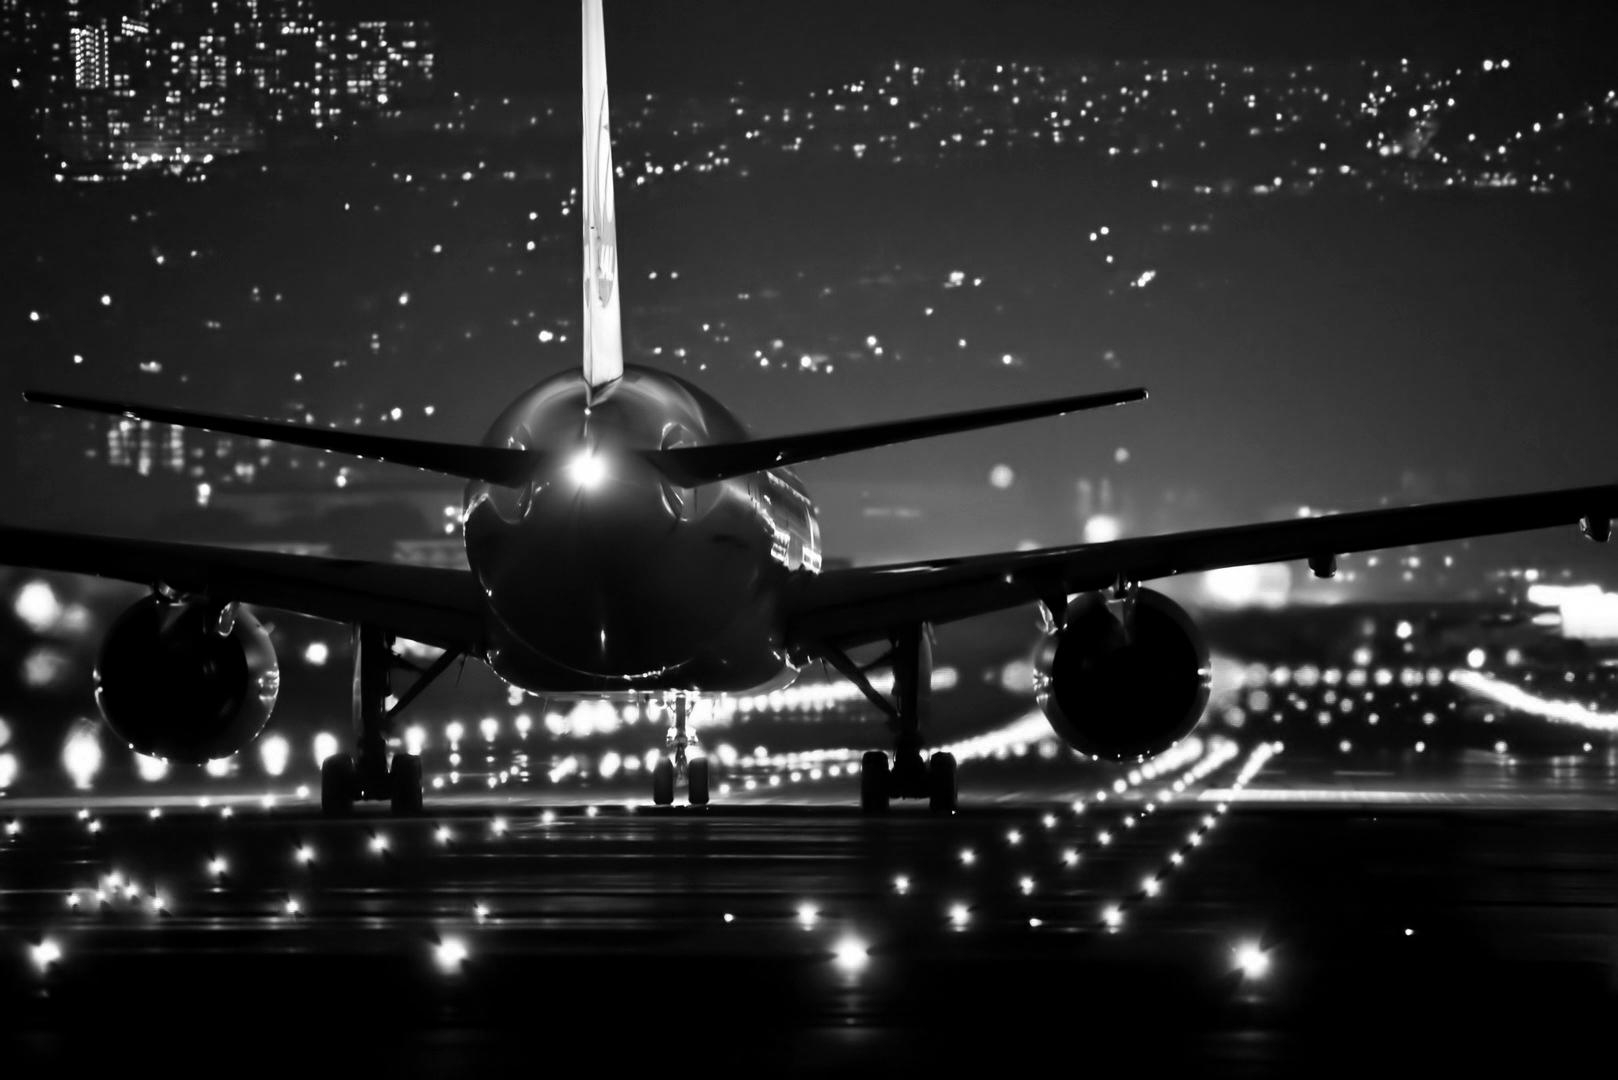 PRESS RELEASE: General MRO Aerospace Inc